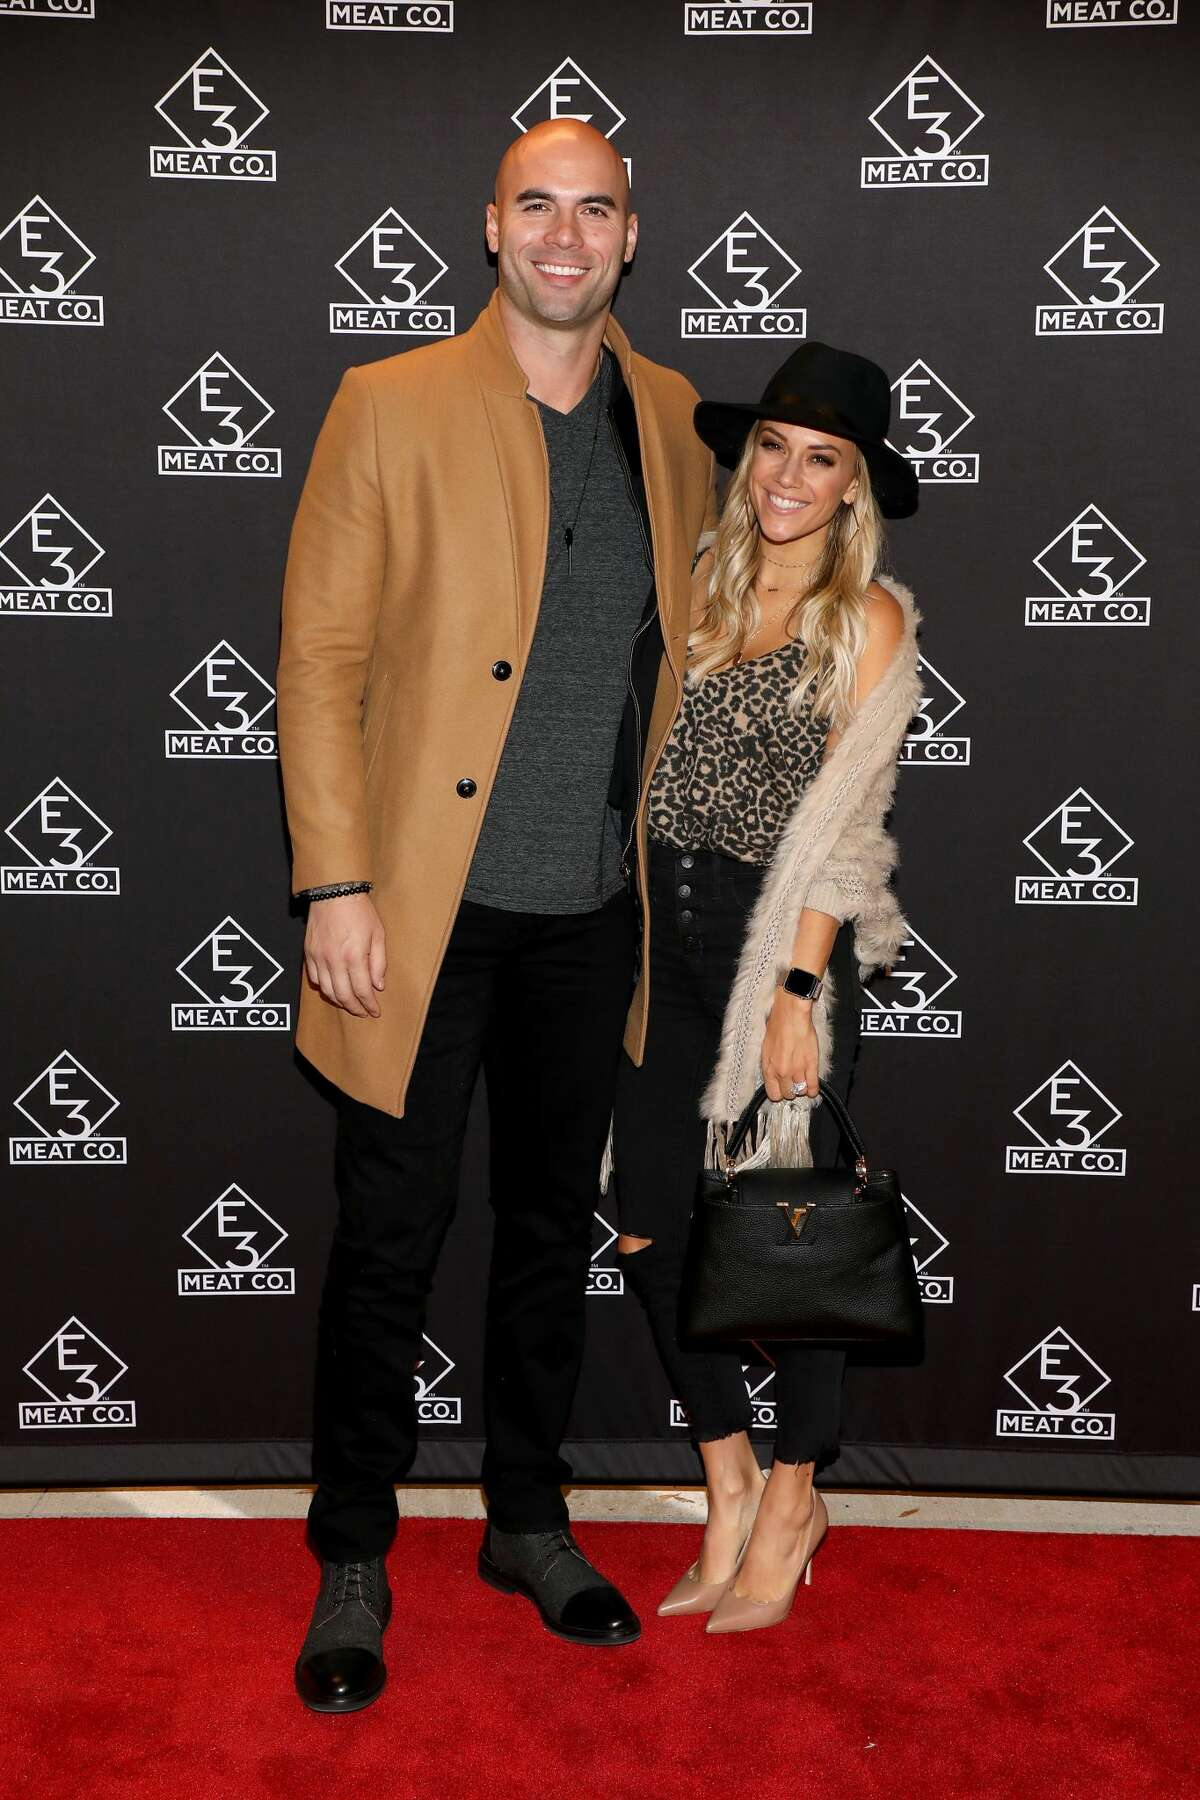 Jana Kramer and her husband Mike Caussin